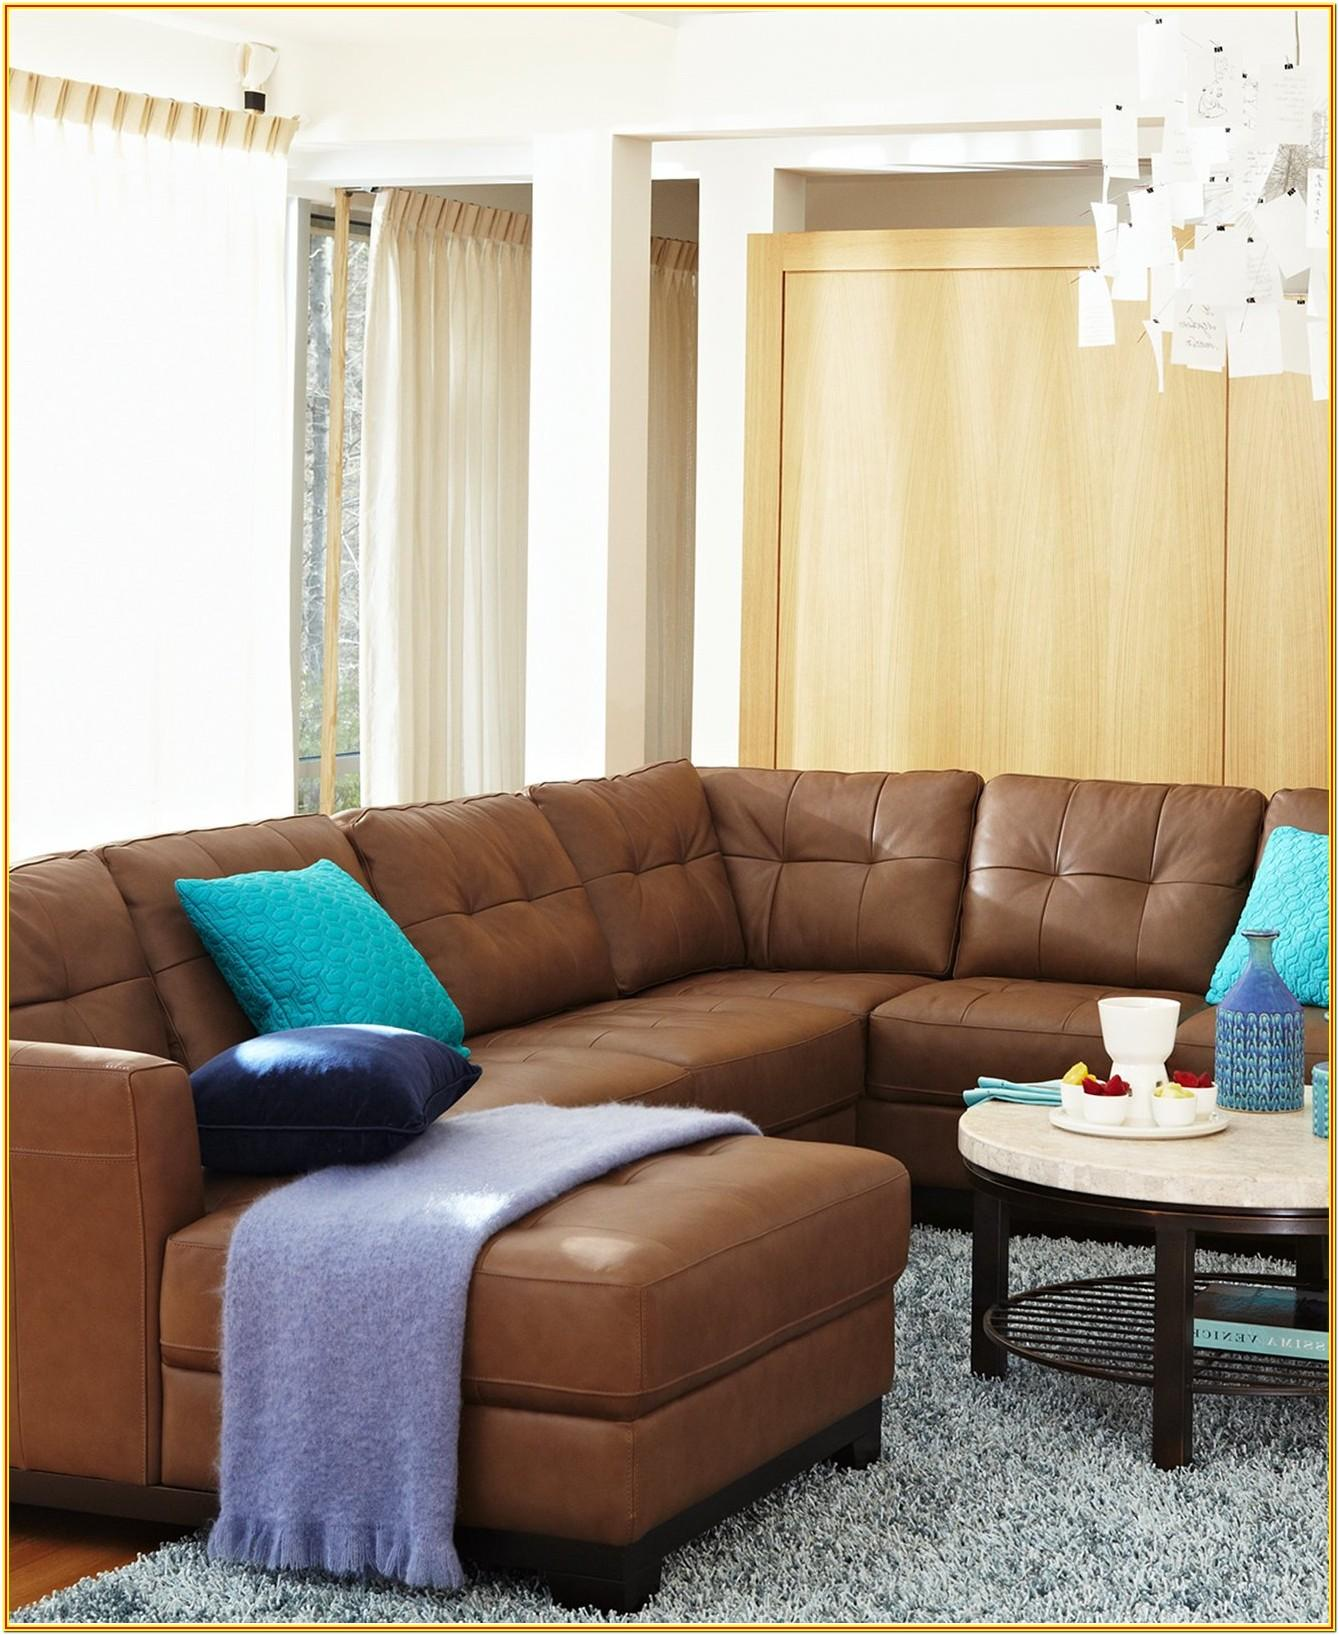 Macys Furniture Living Room Sofa